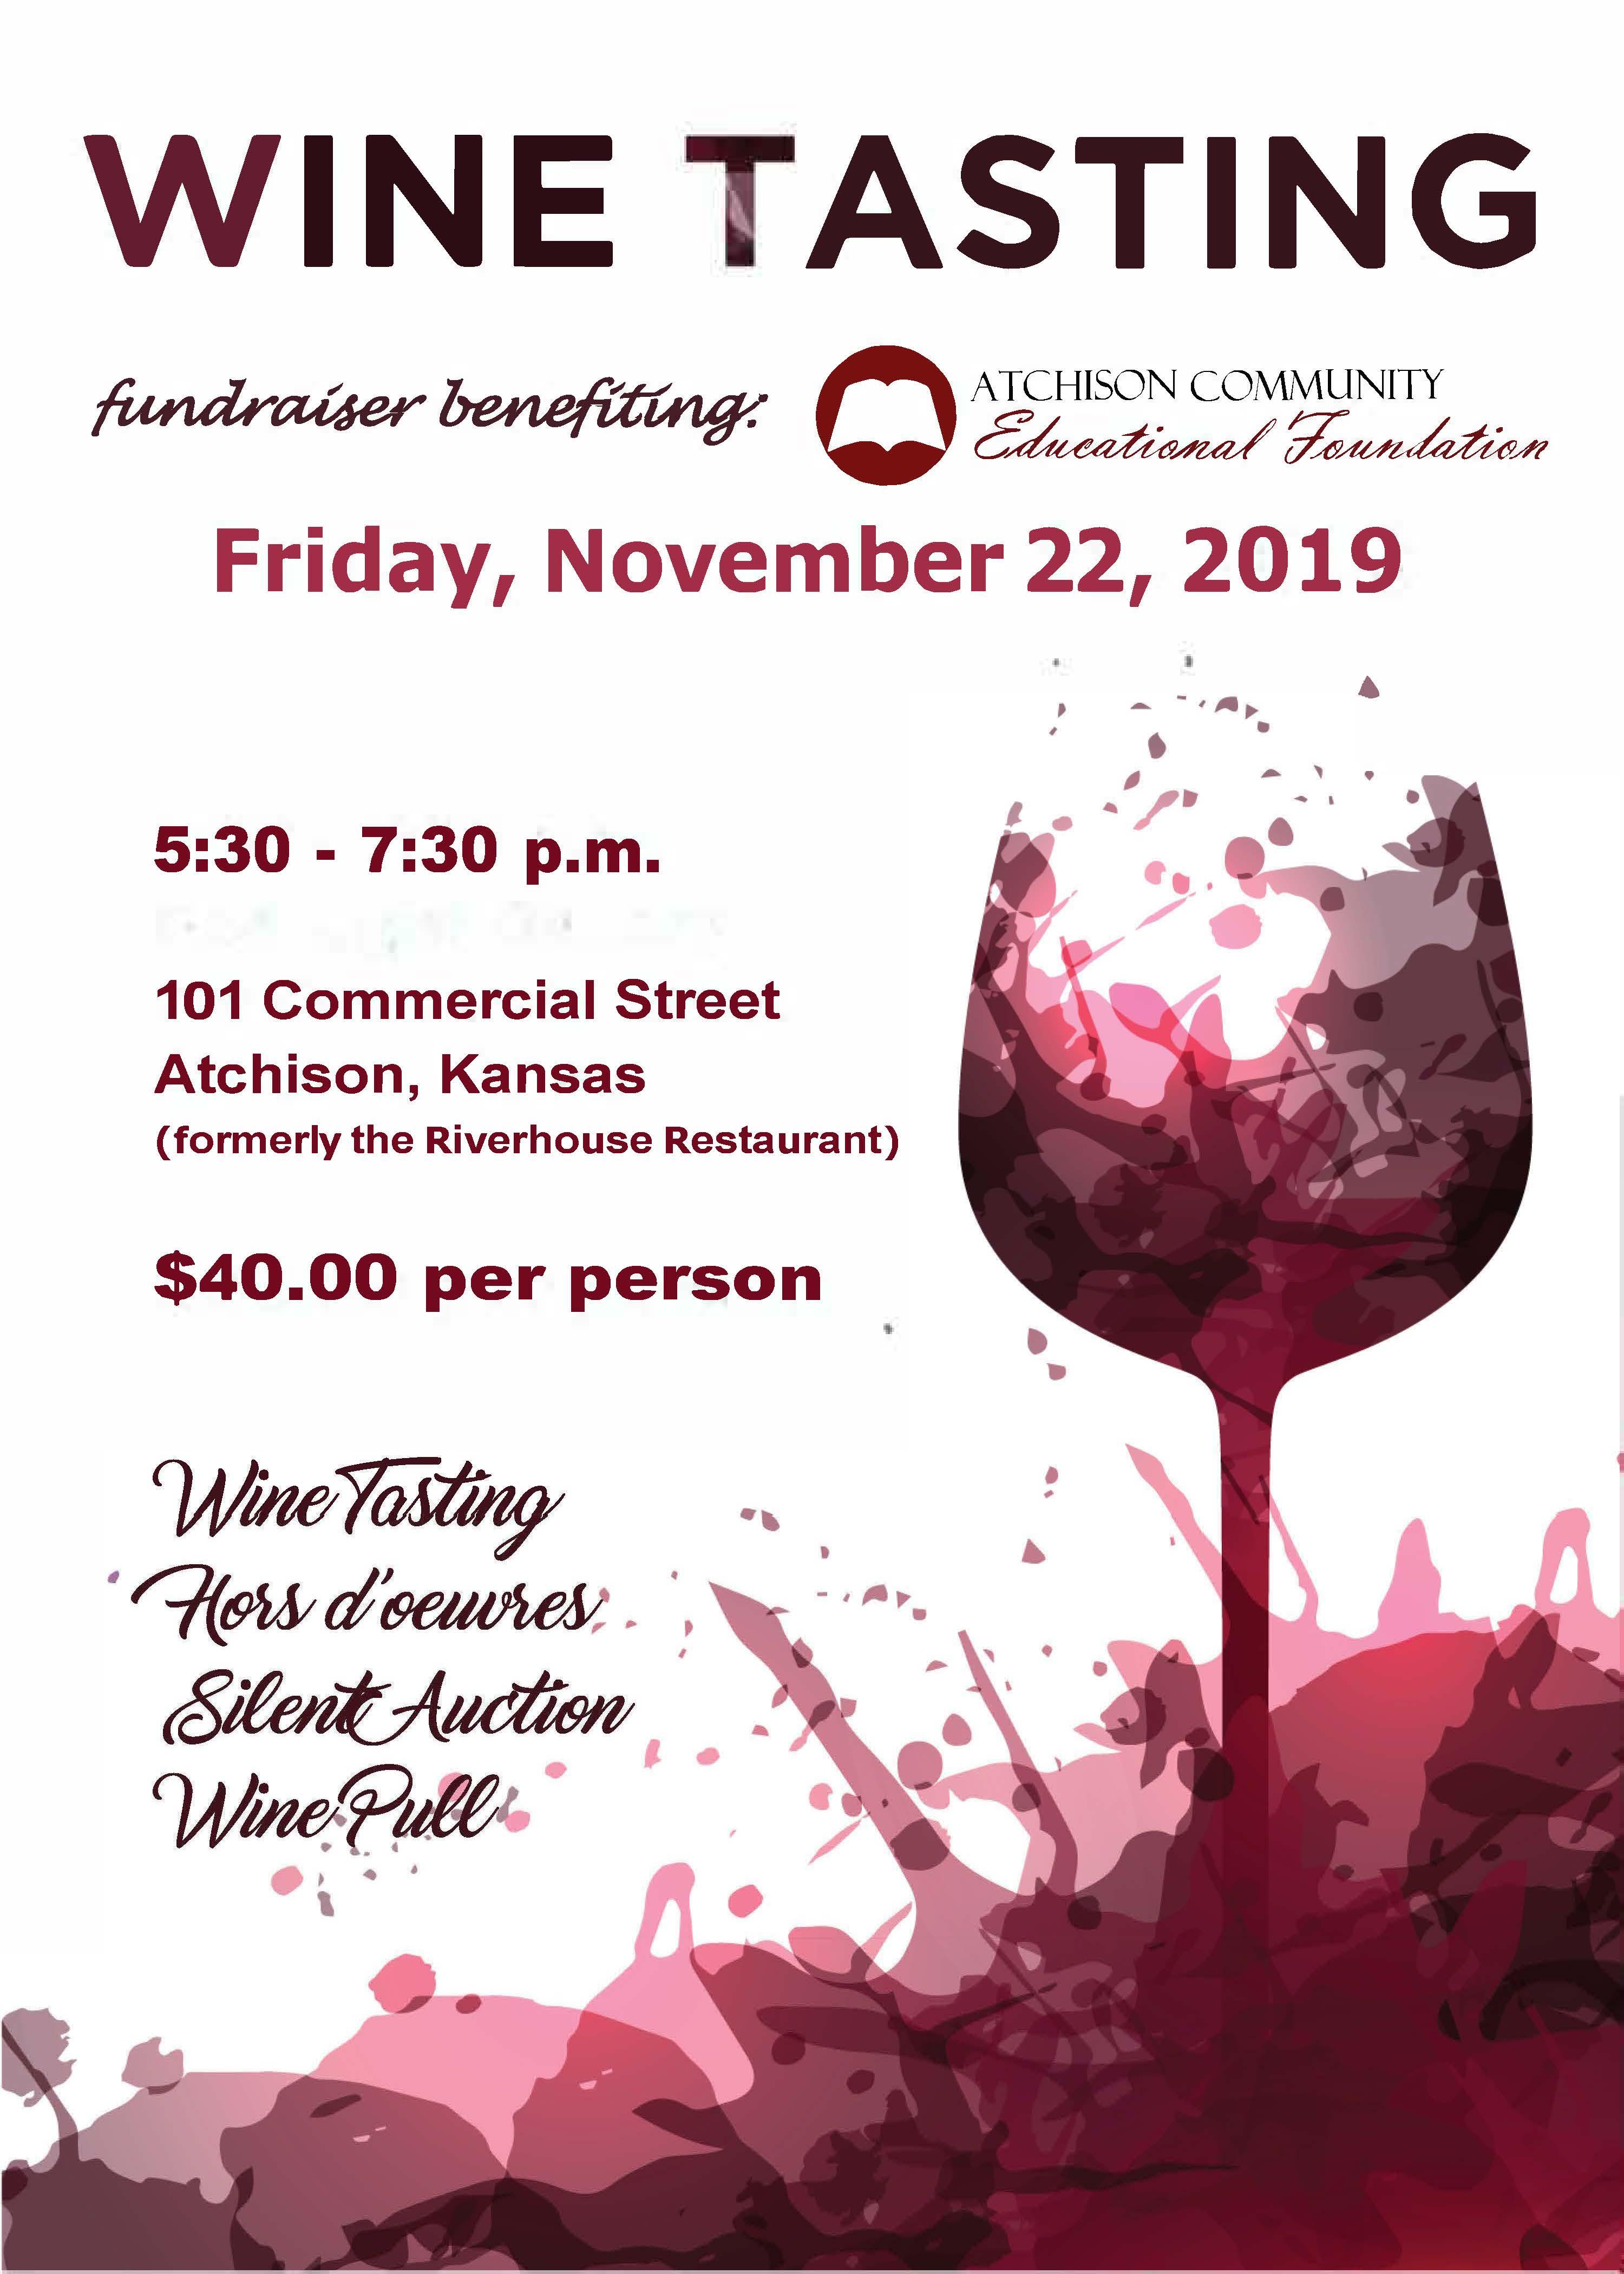 ACEF Wine Tasting Flyer 2019